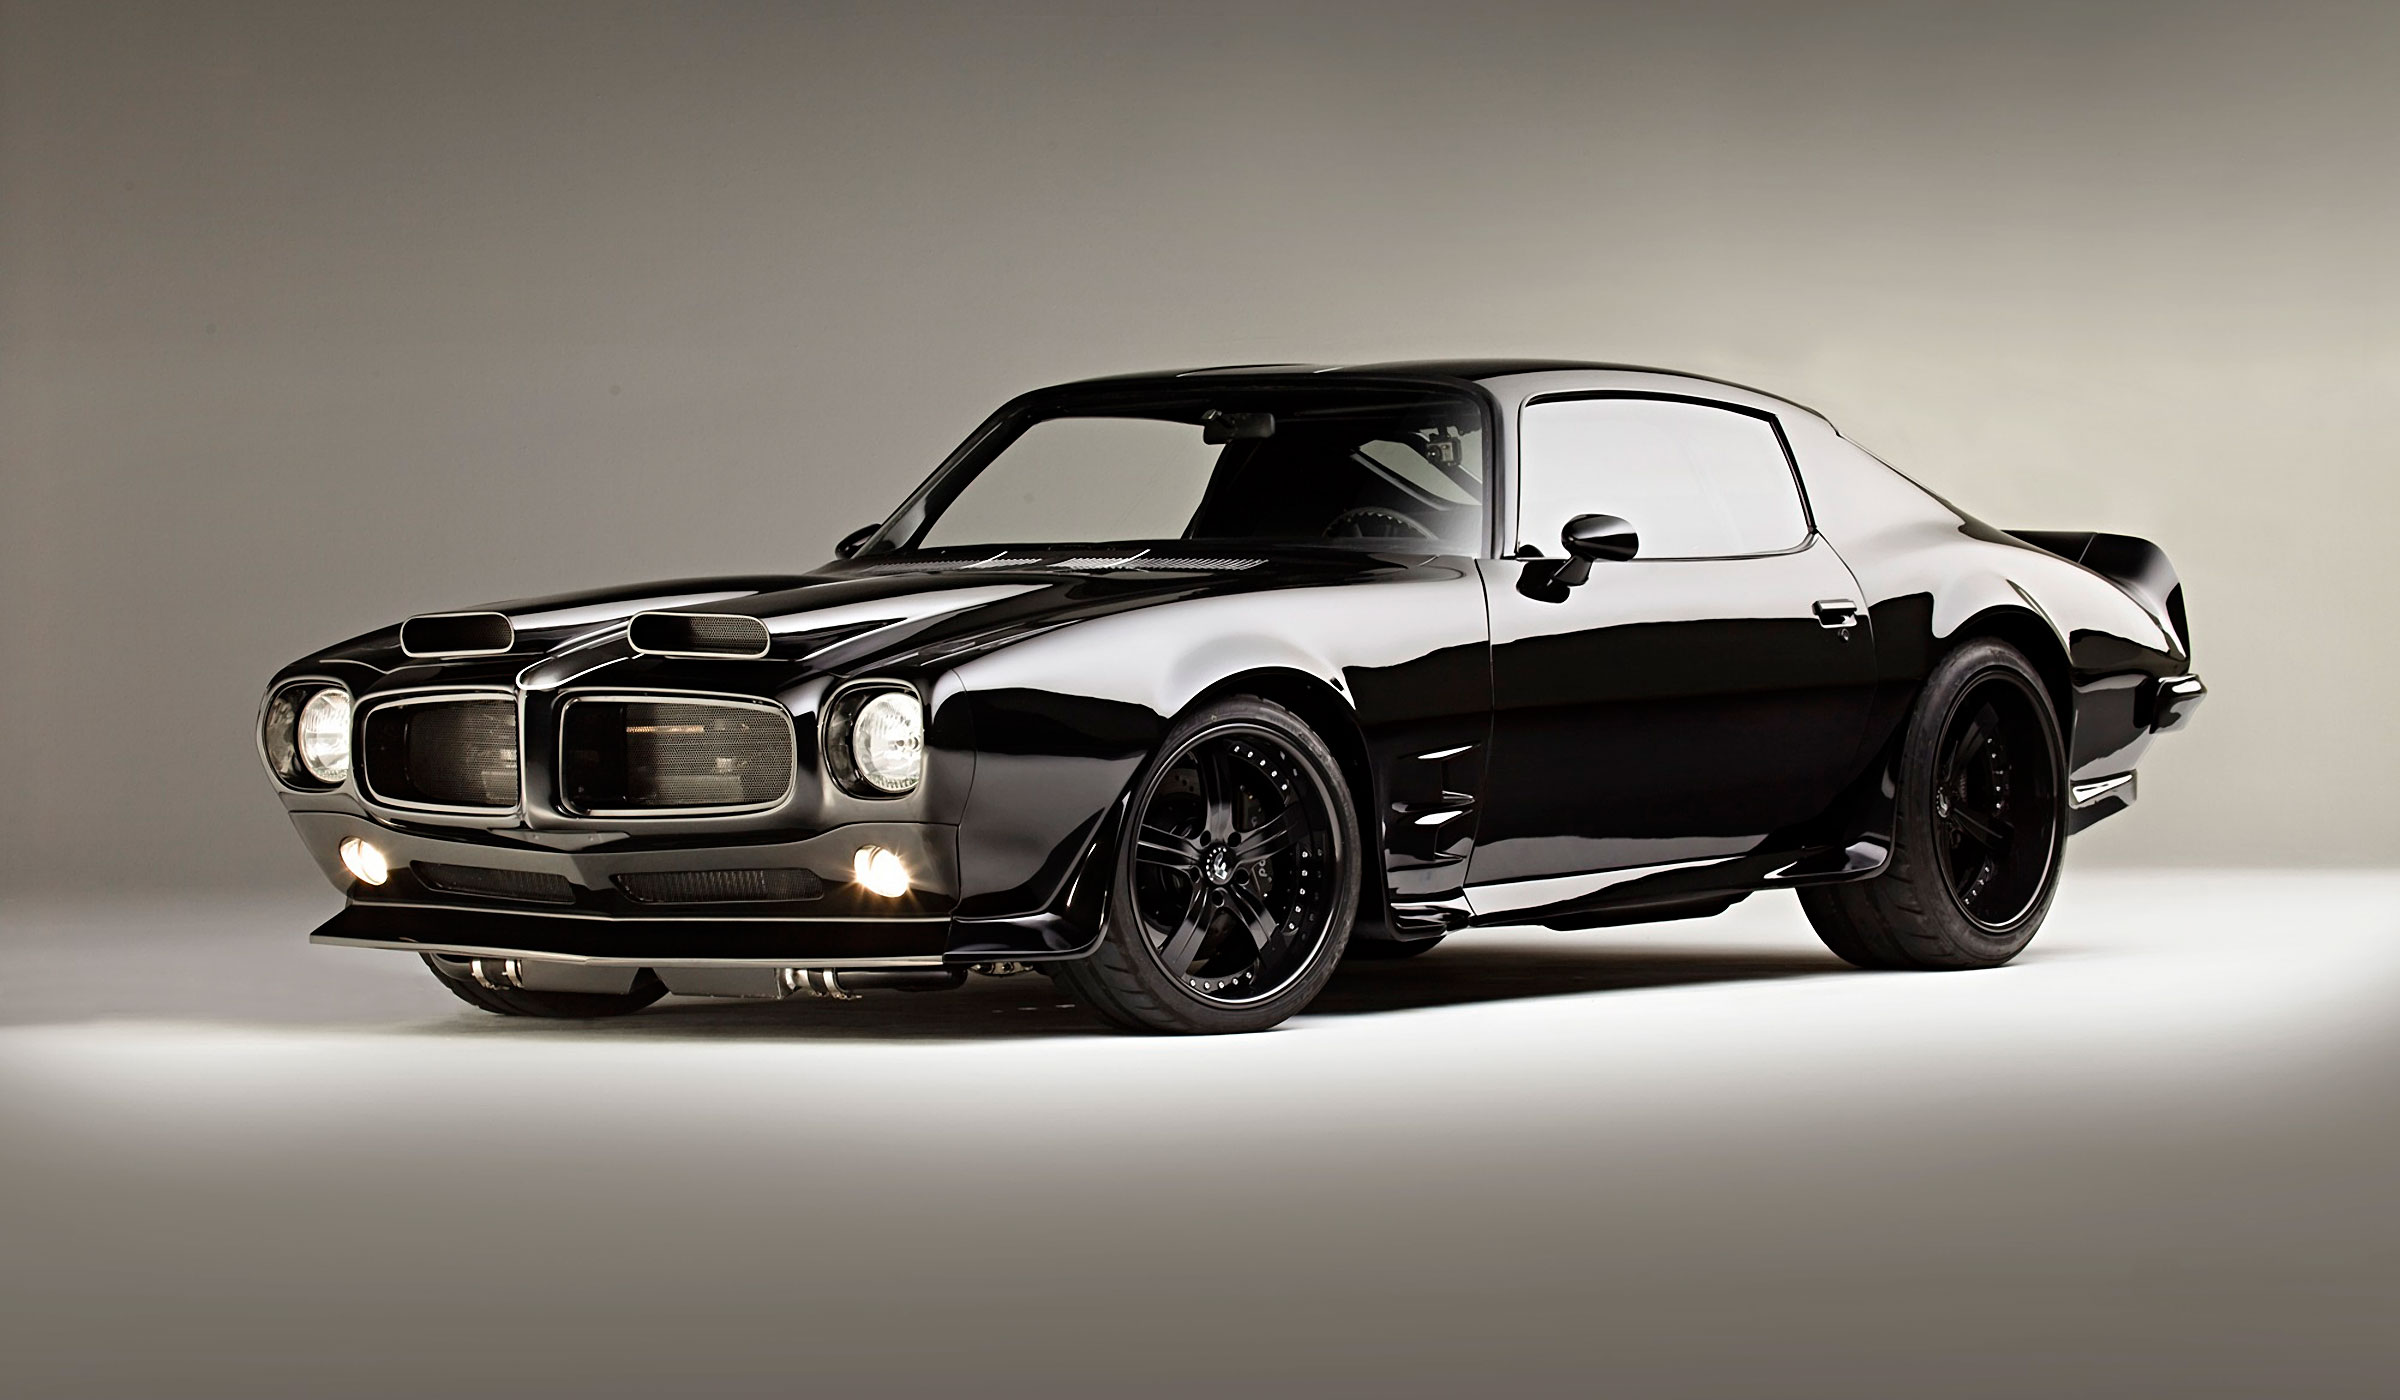 Pontiac-Firebird-1970-Twin-Turbo-by-All-Speed-Customs1